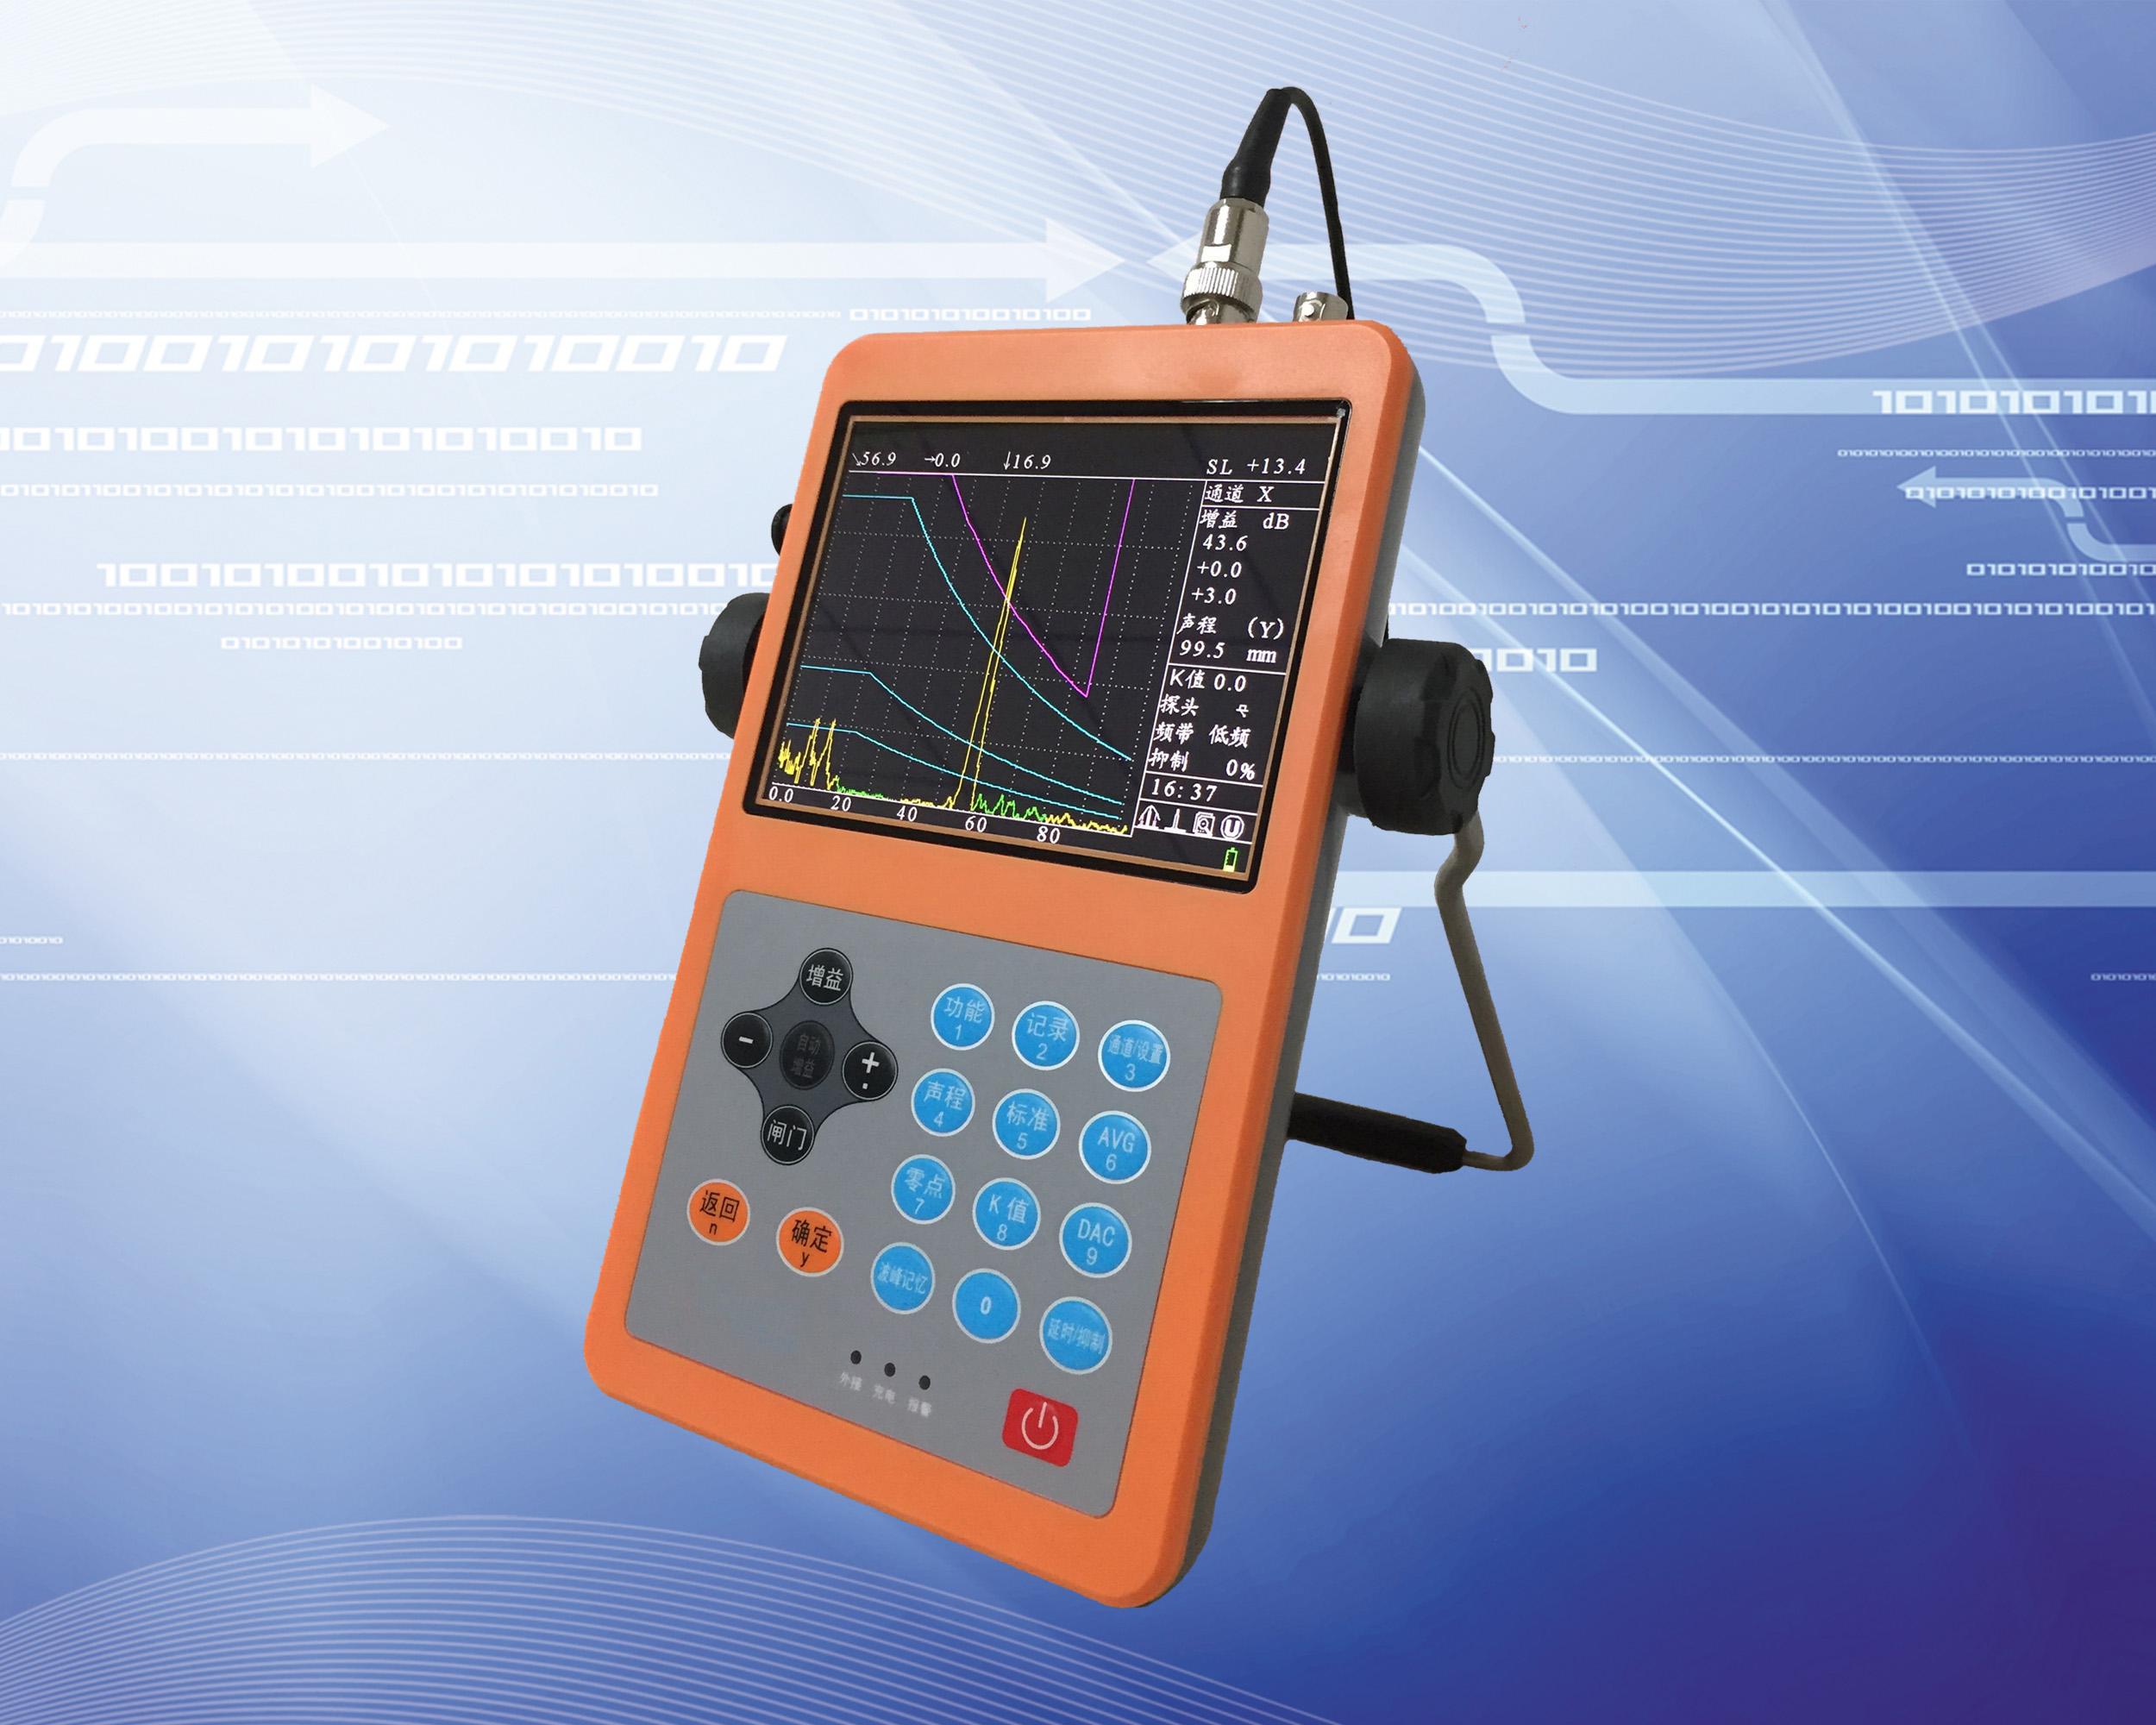 welding/metal digital portable ultrasonic flaw detector